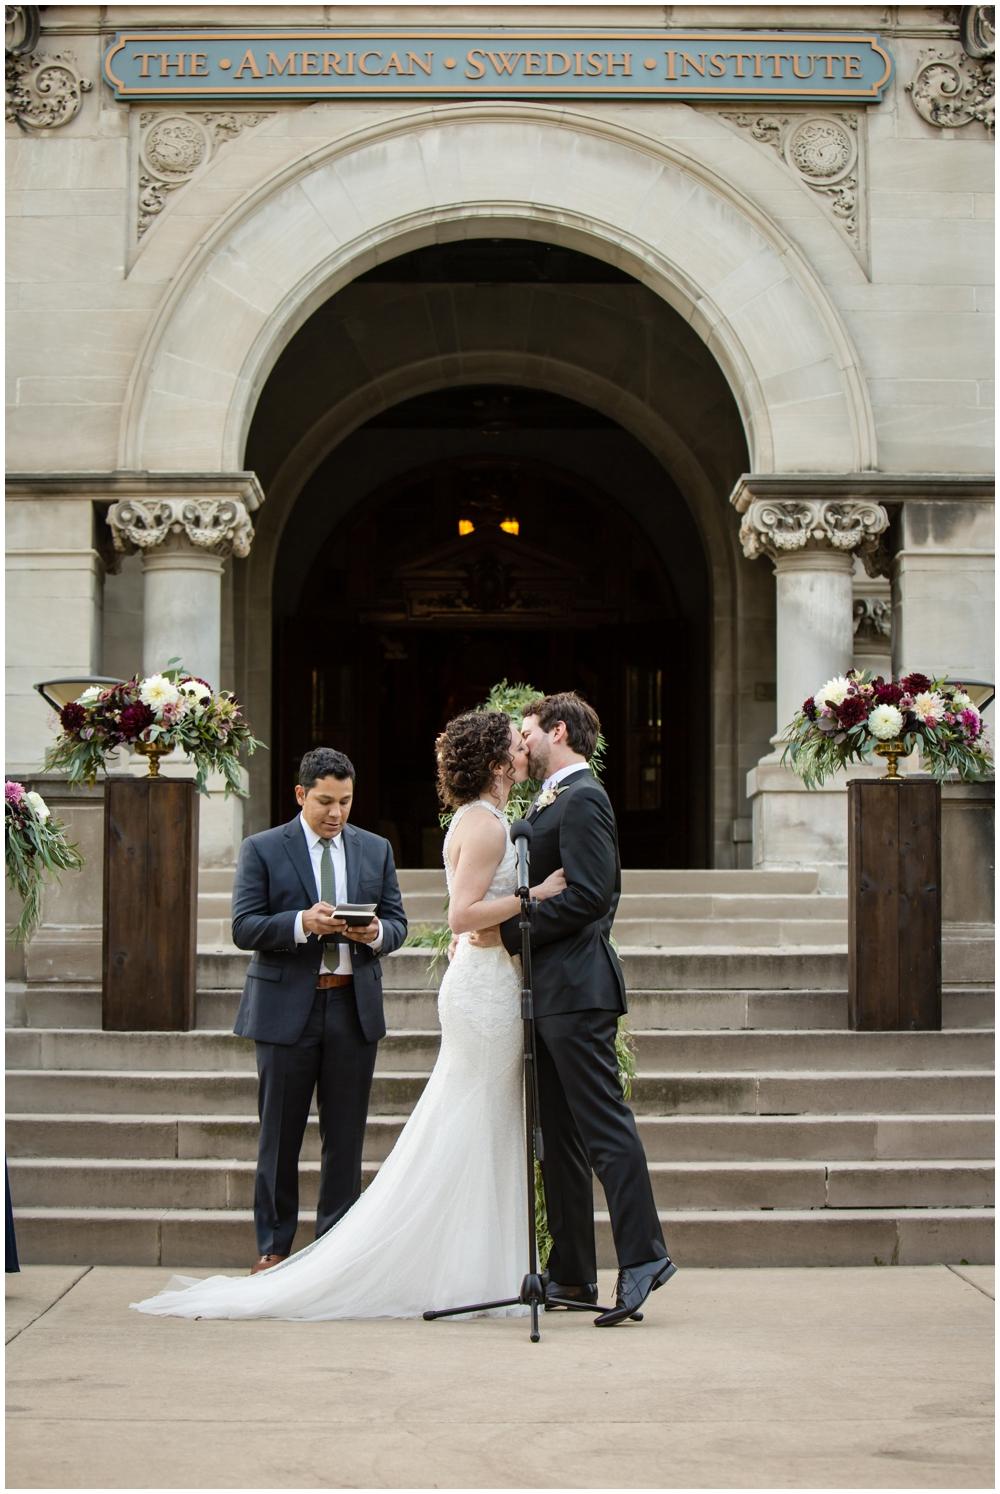 American Swedish Institute Wedding_0084.jpg